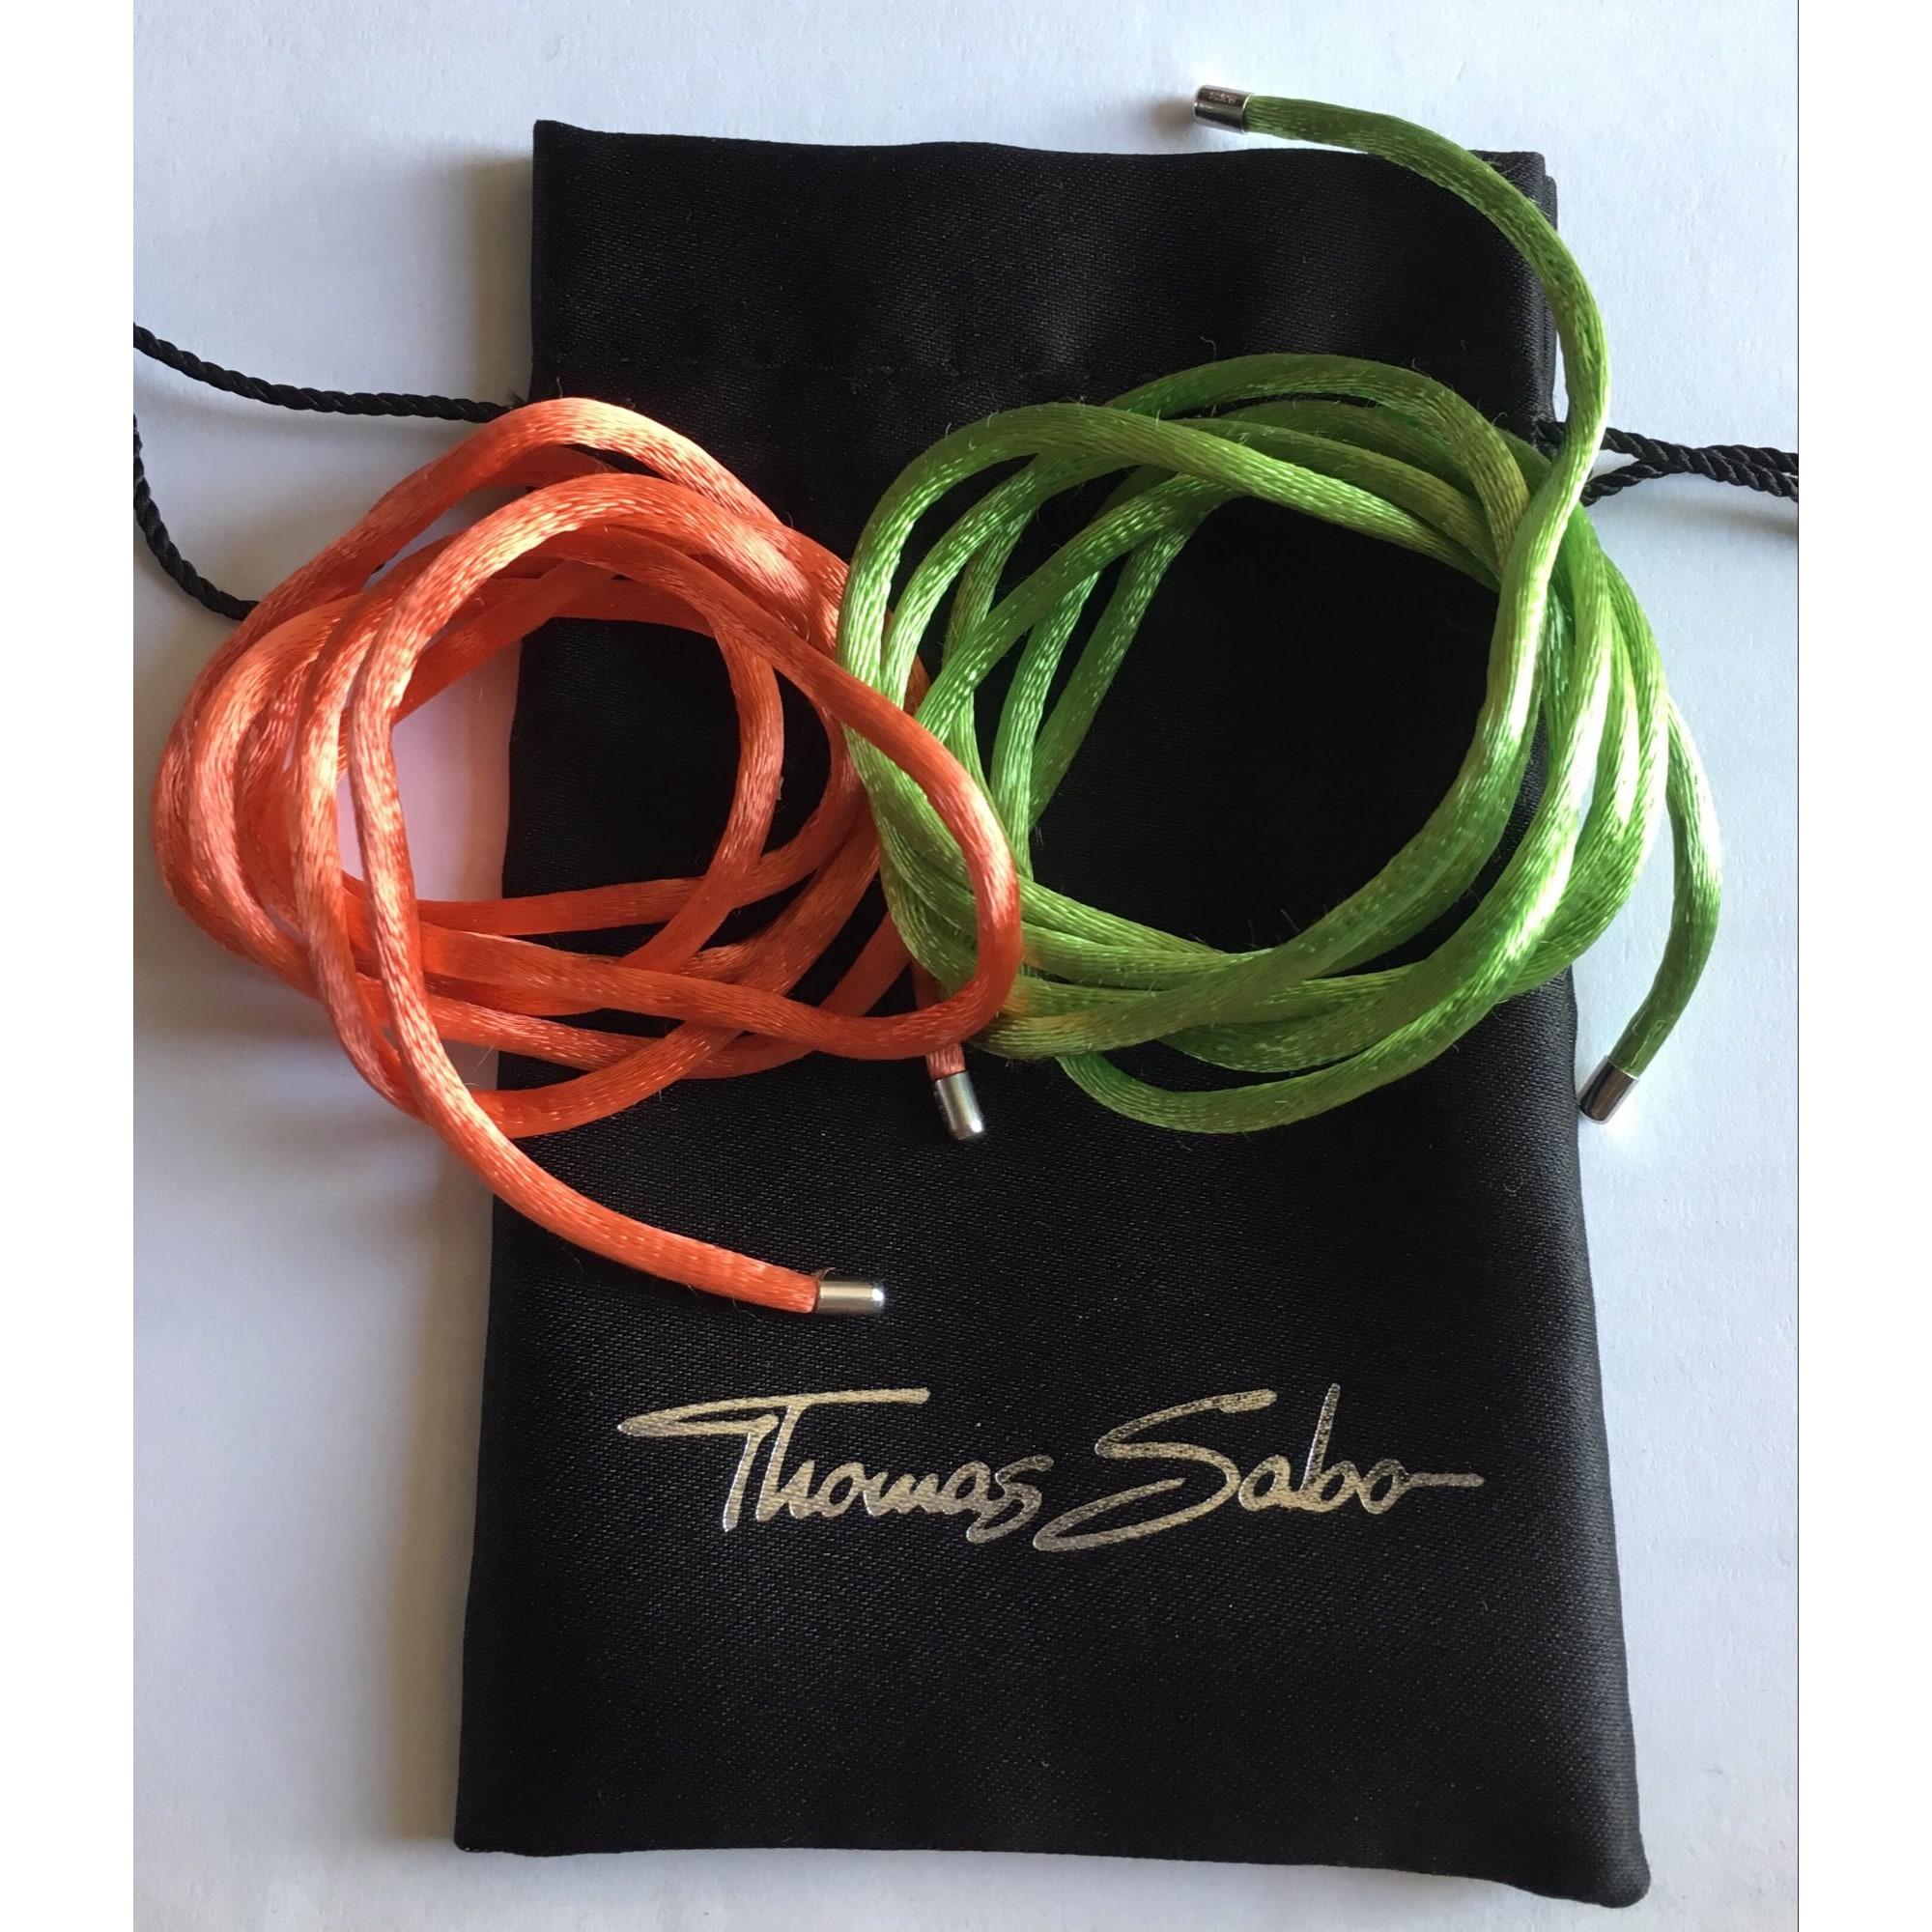 Collier THOMAS SABO Multicouleur